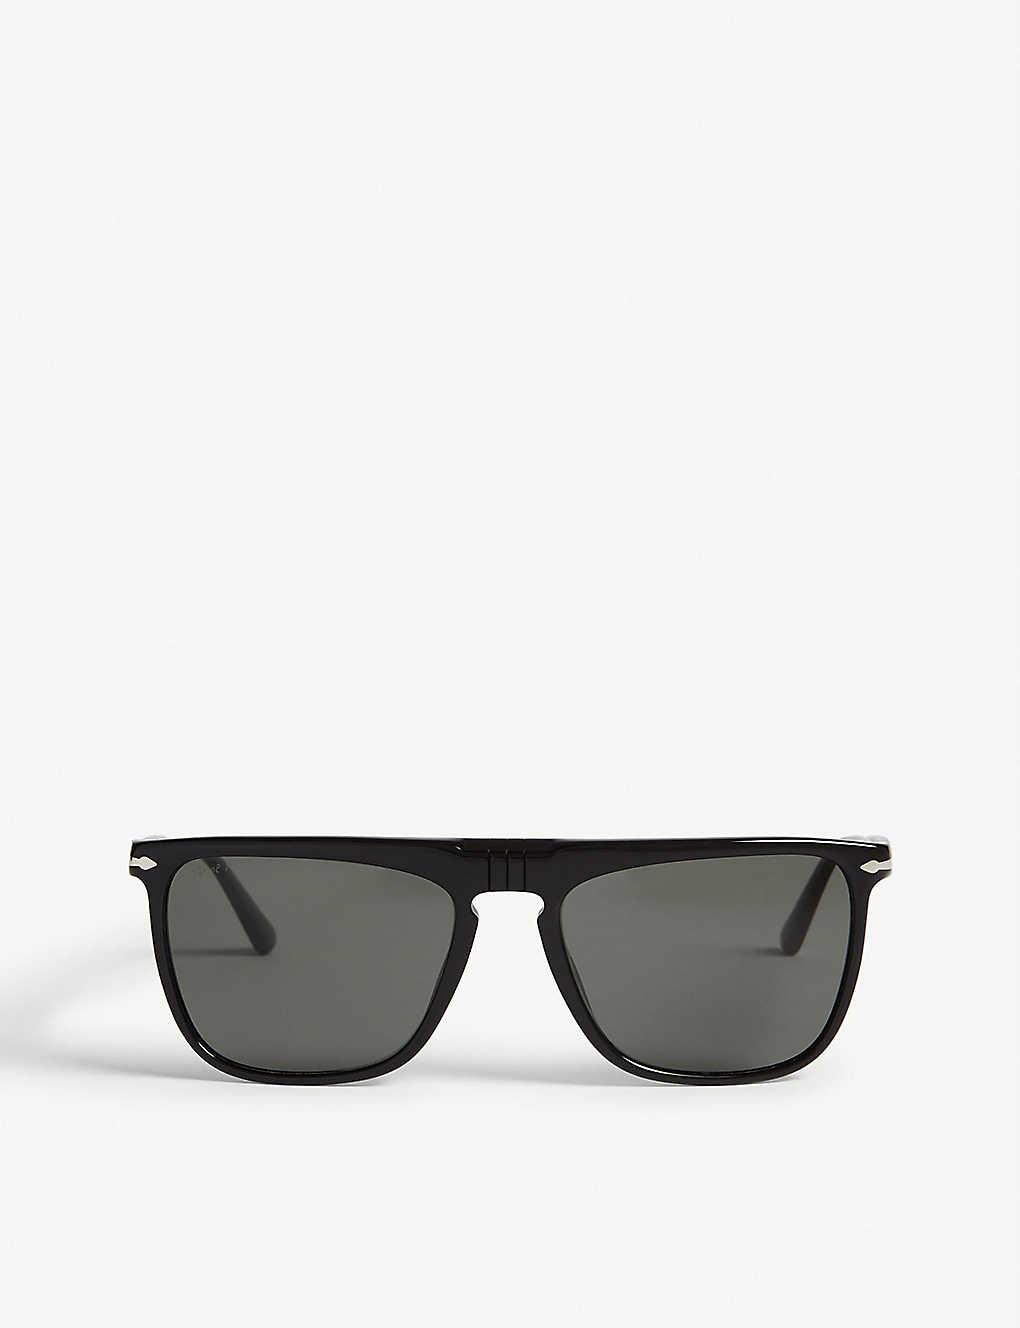 56067496d2c3 PERSOL - PO3225 square-frame sunglasses | Selfridges.com